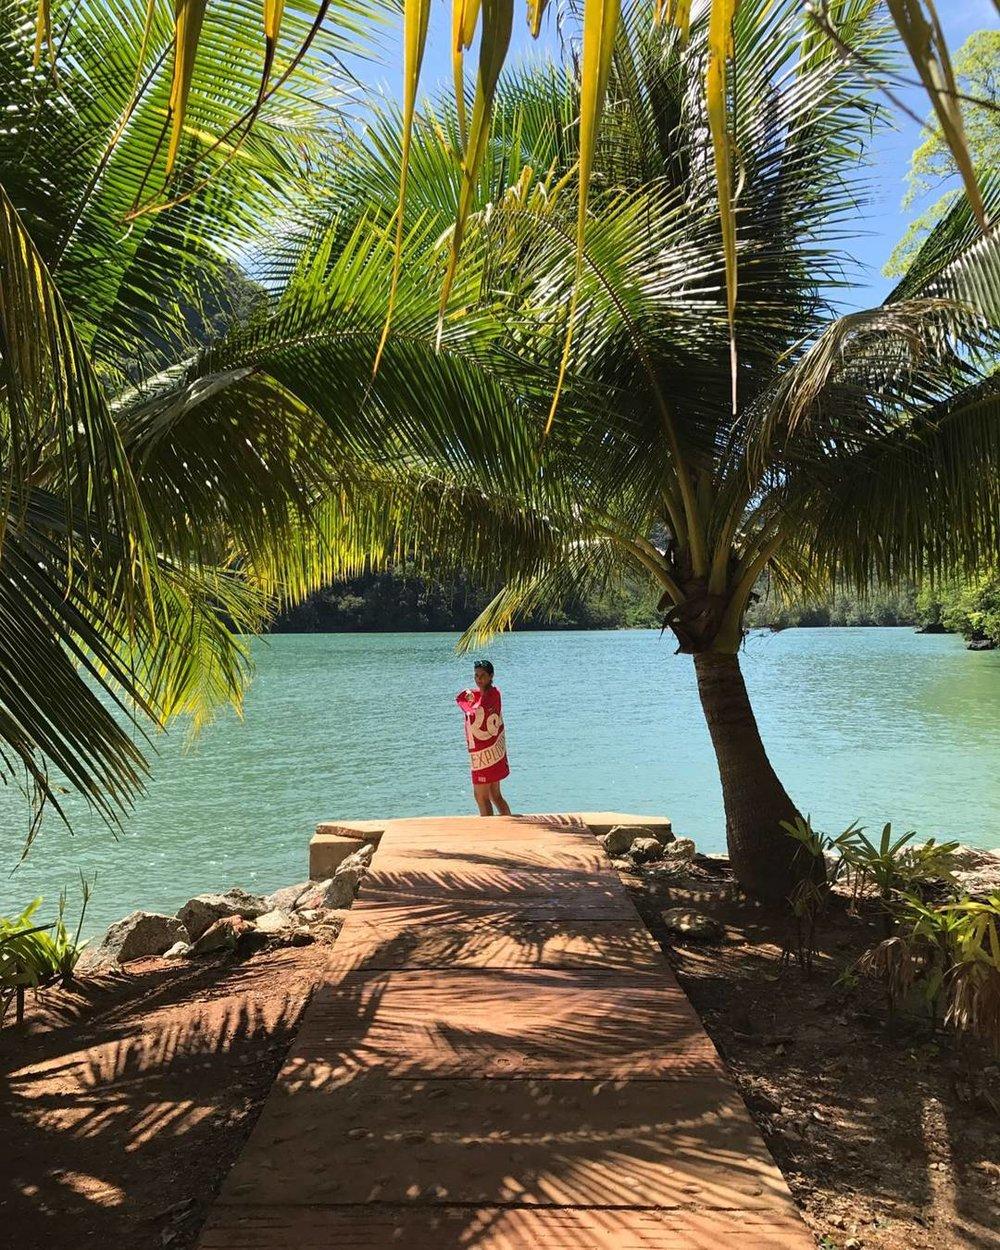 Celebrating bright, warm days, @macklepinoe takes the flag to Pulau Beras Basah